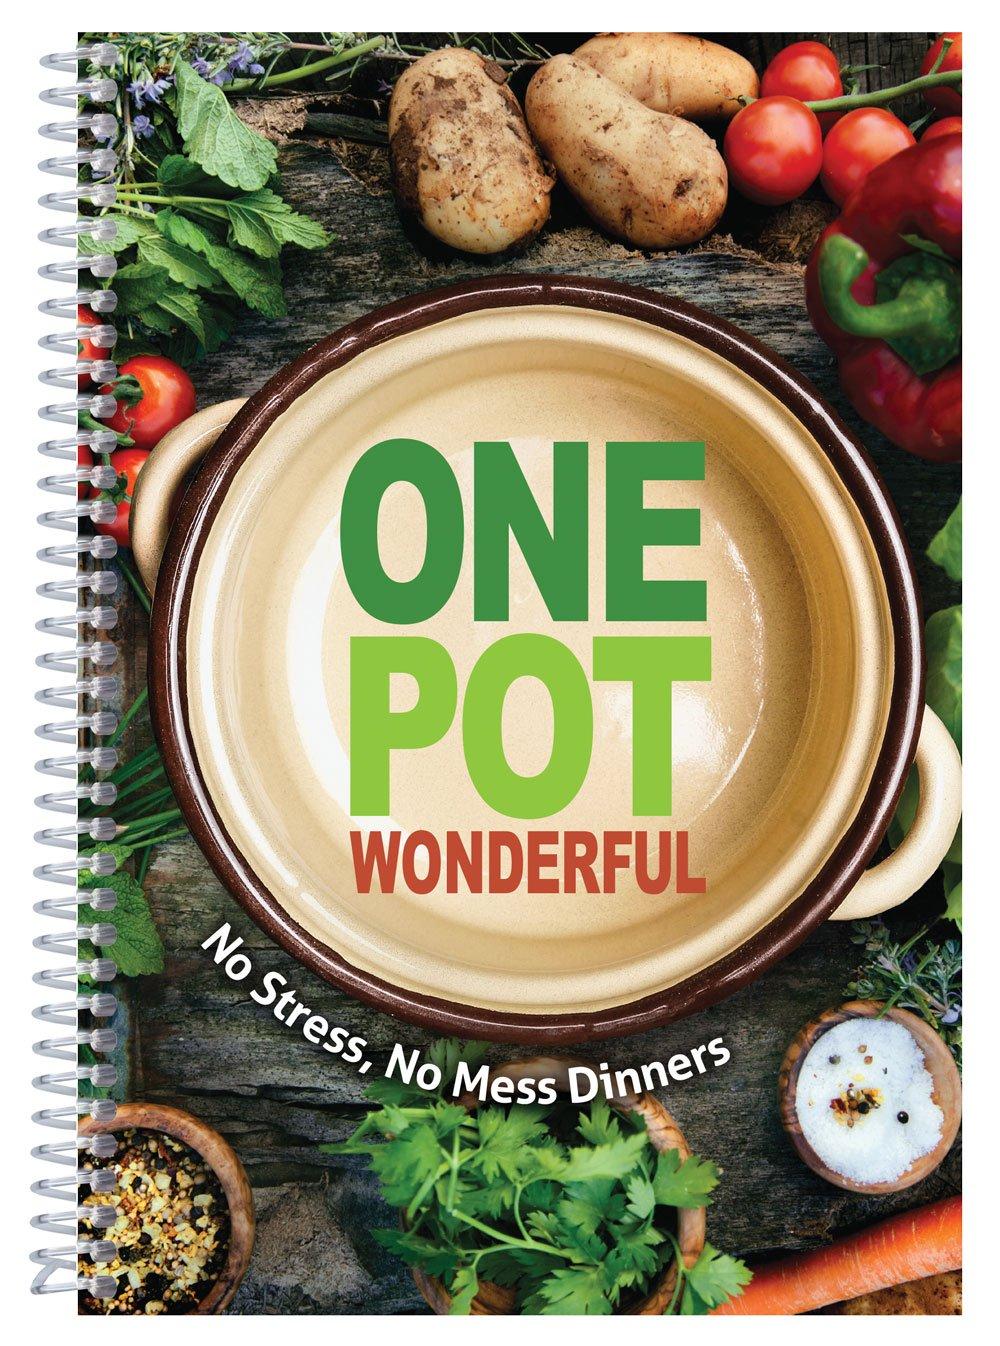 One Pot Wonderful